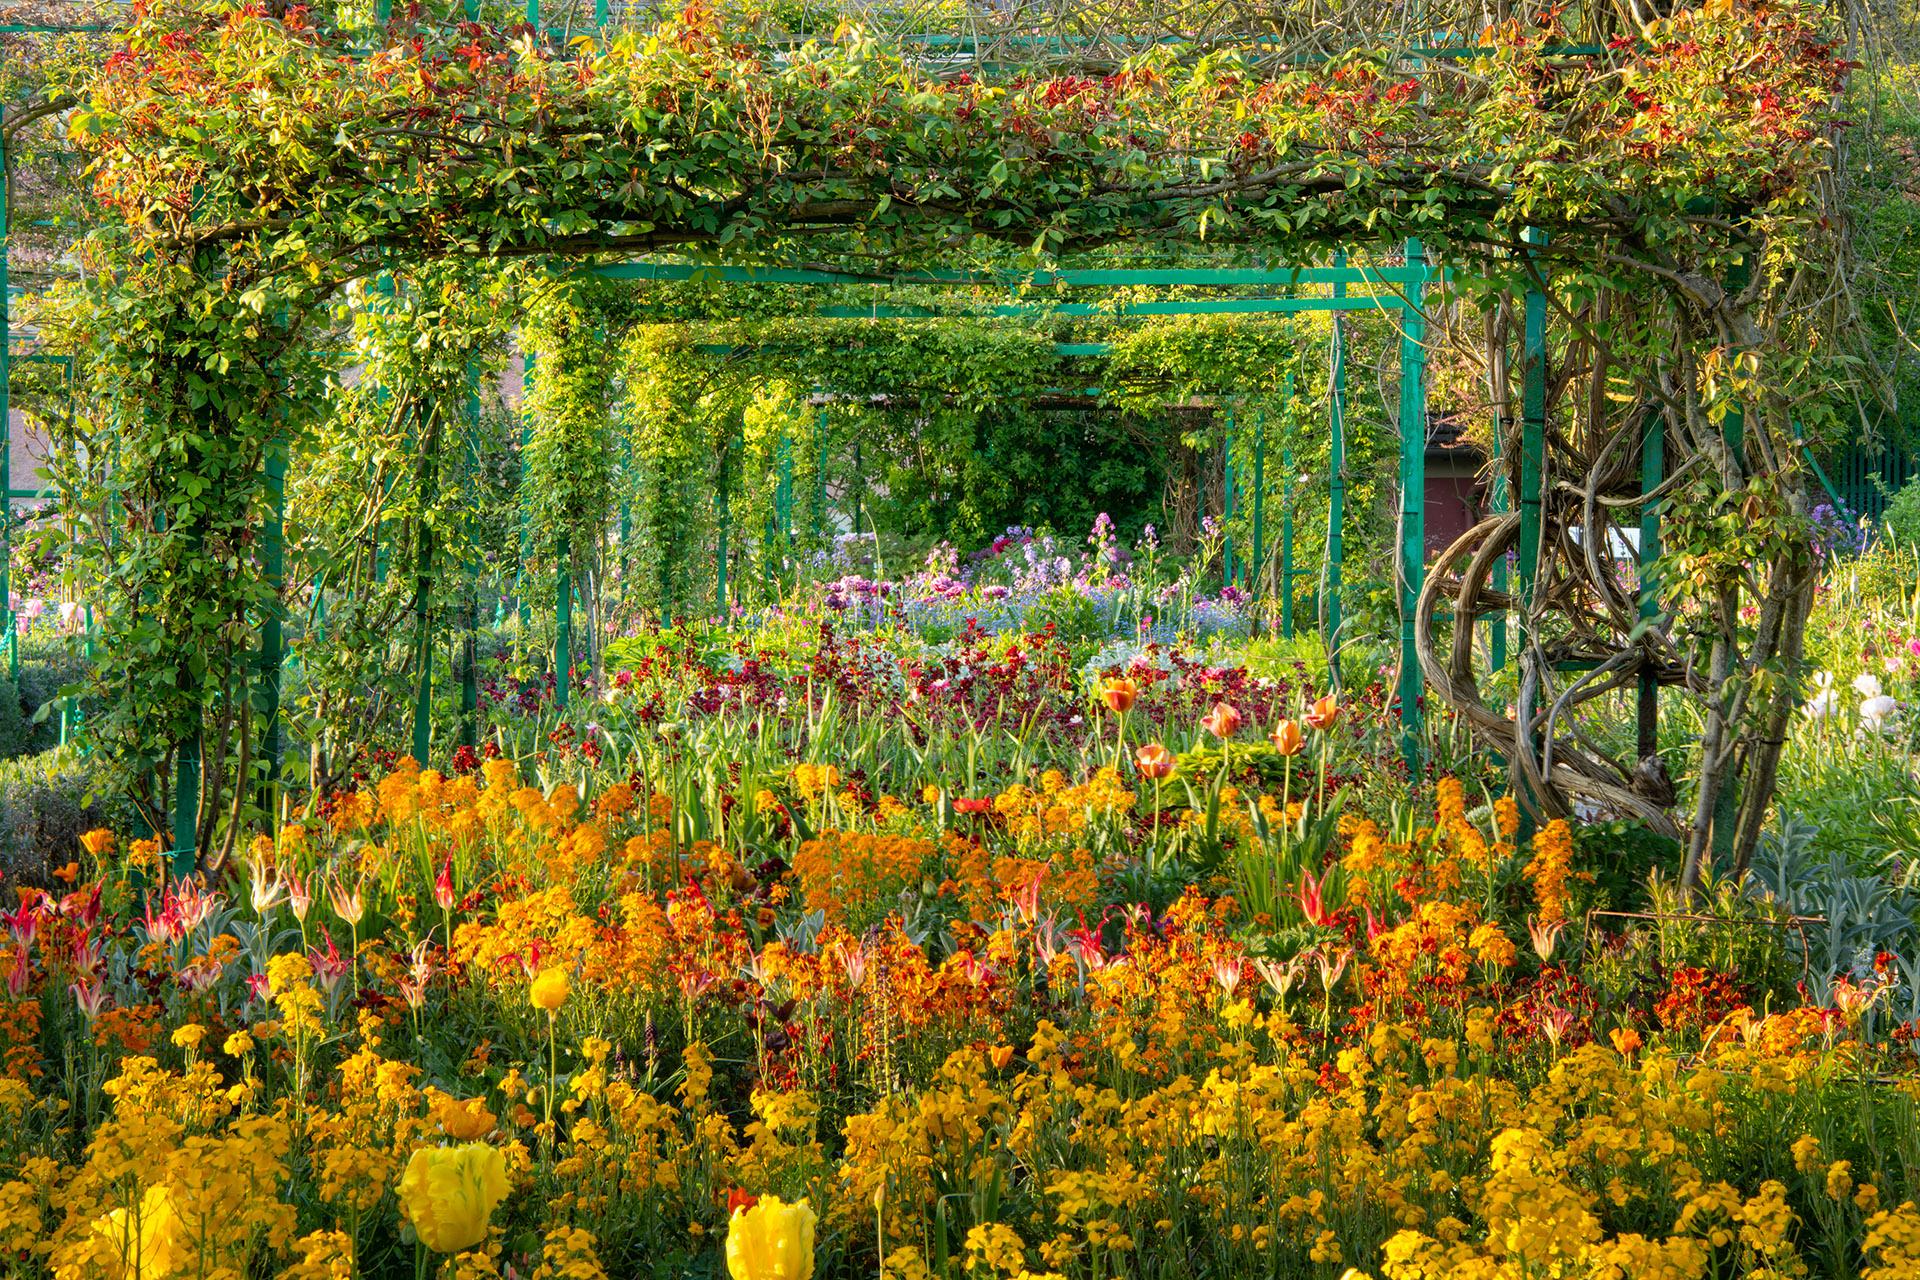 Flowers at Giverny © Harold Davis